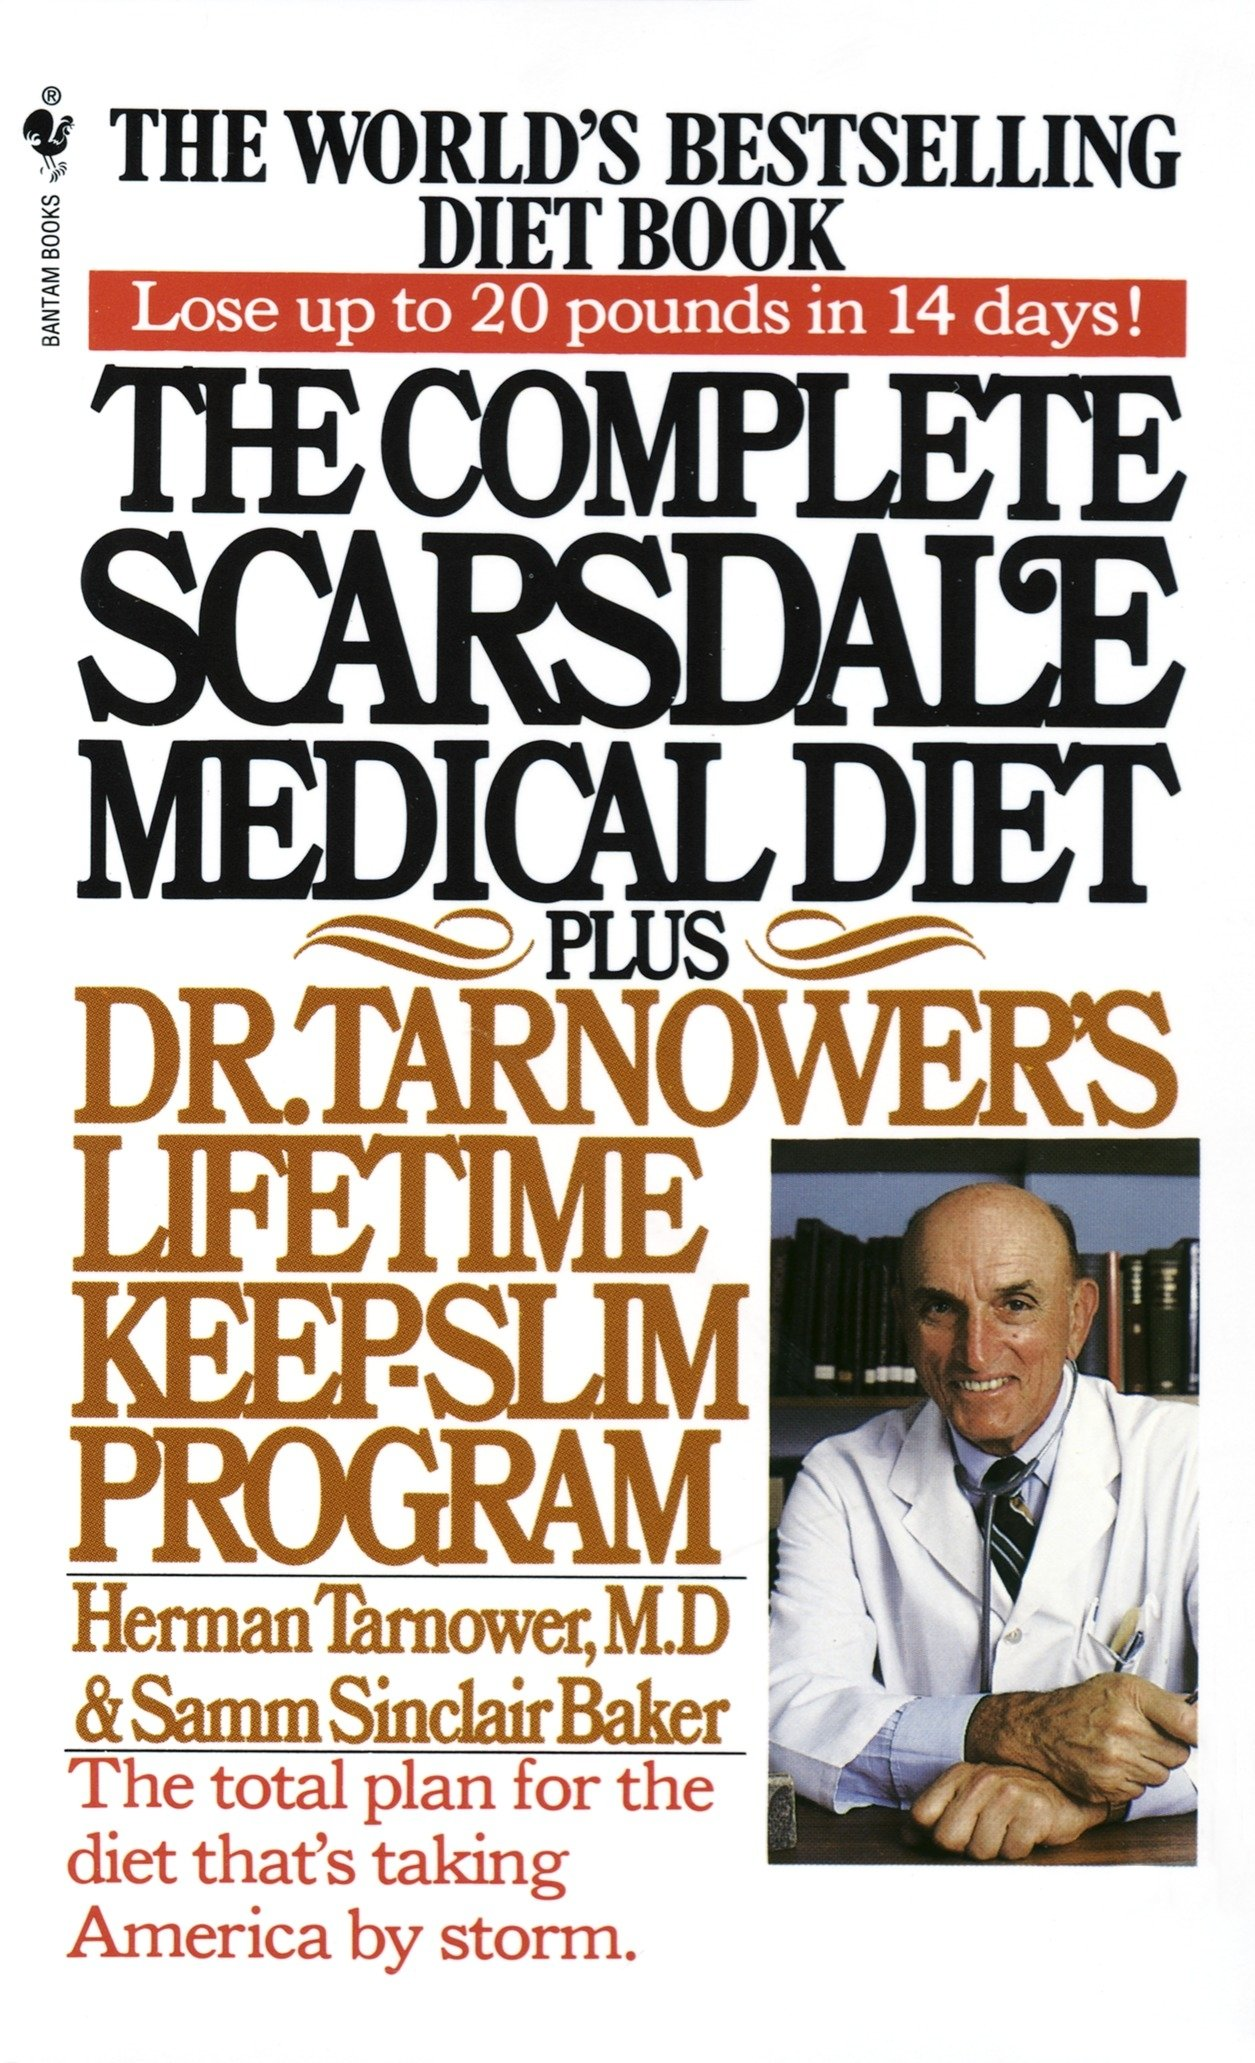 dieta scarsdale completa pdf gratis